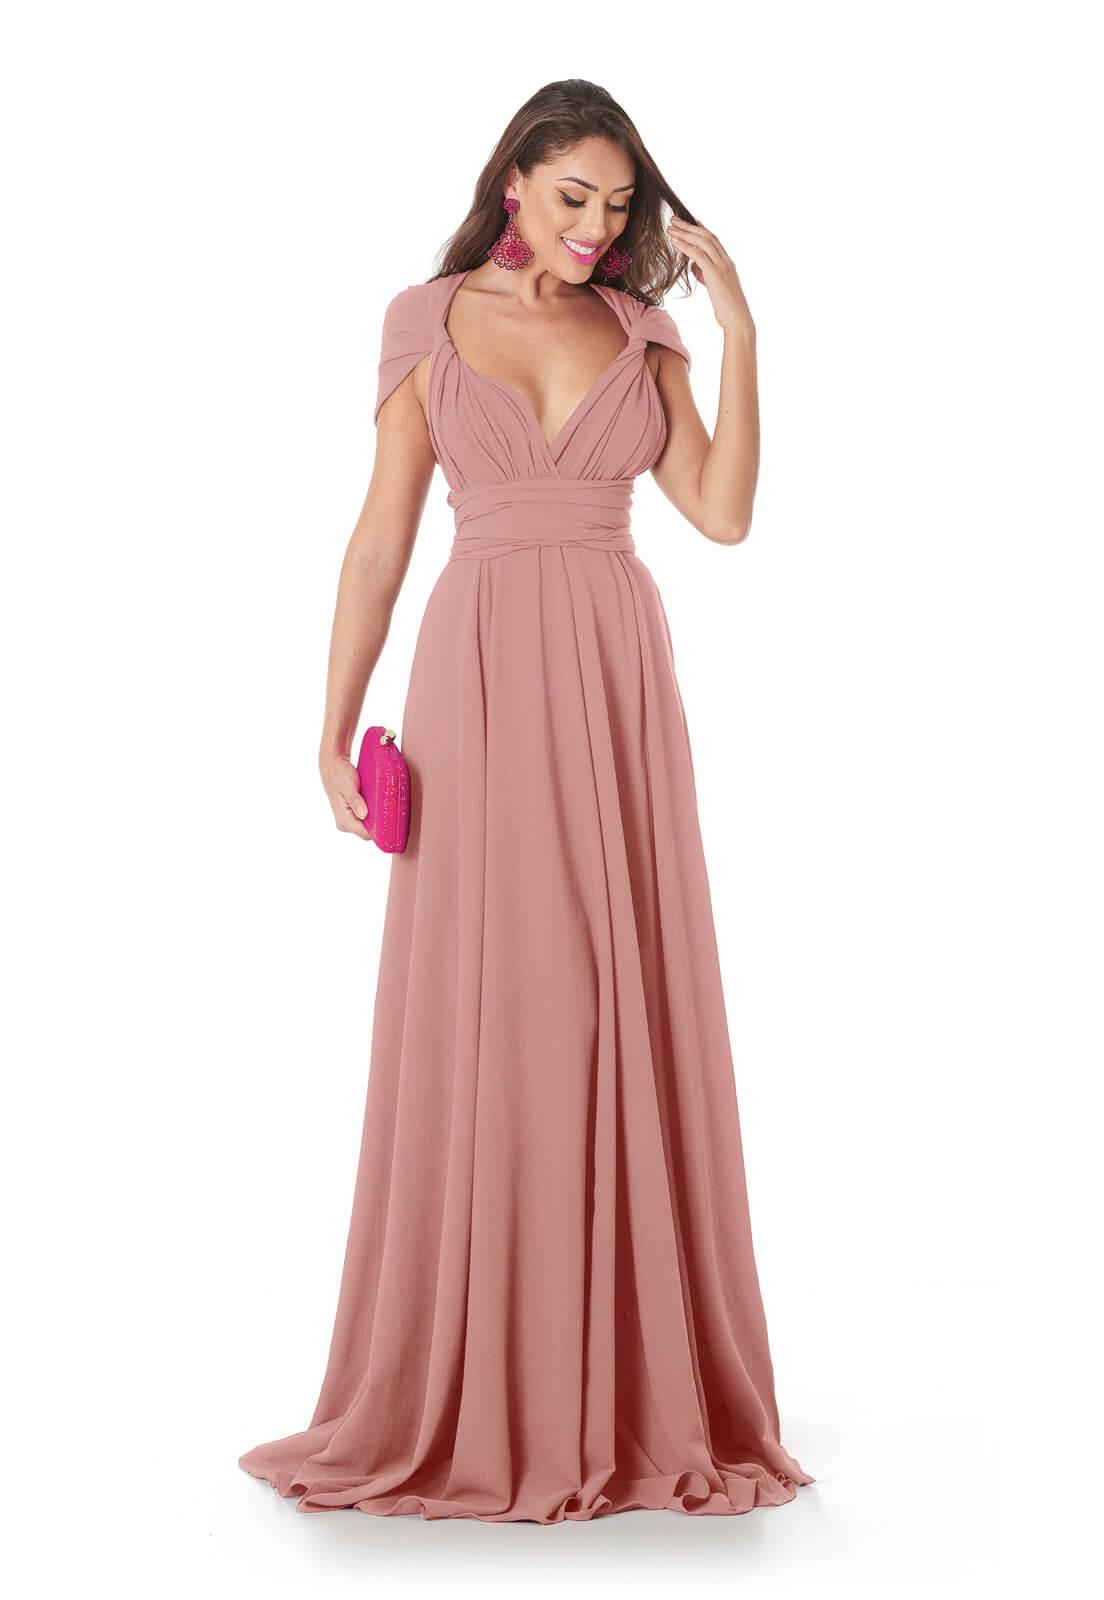 Vestido Longo Mil Formas Rosa Peach Lala Dubi